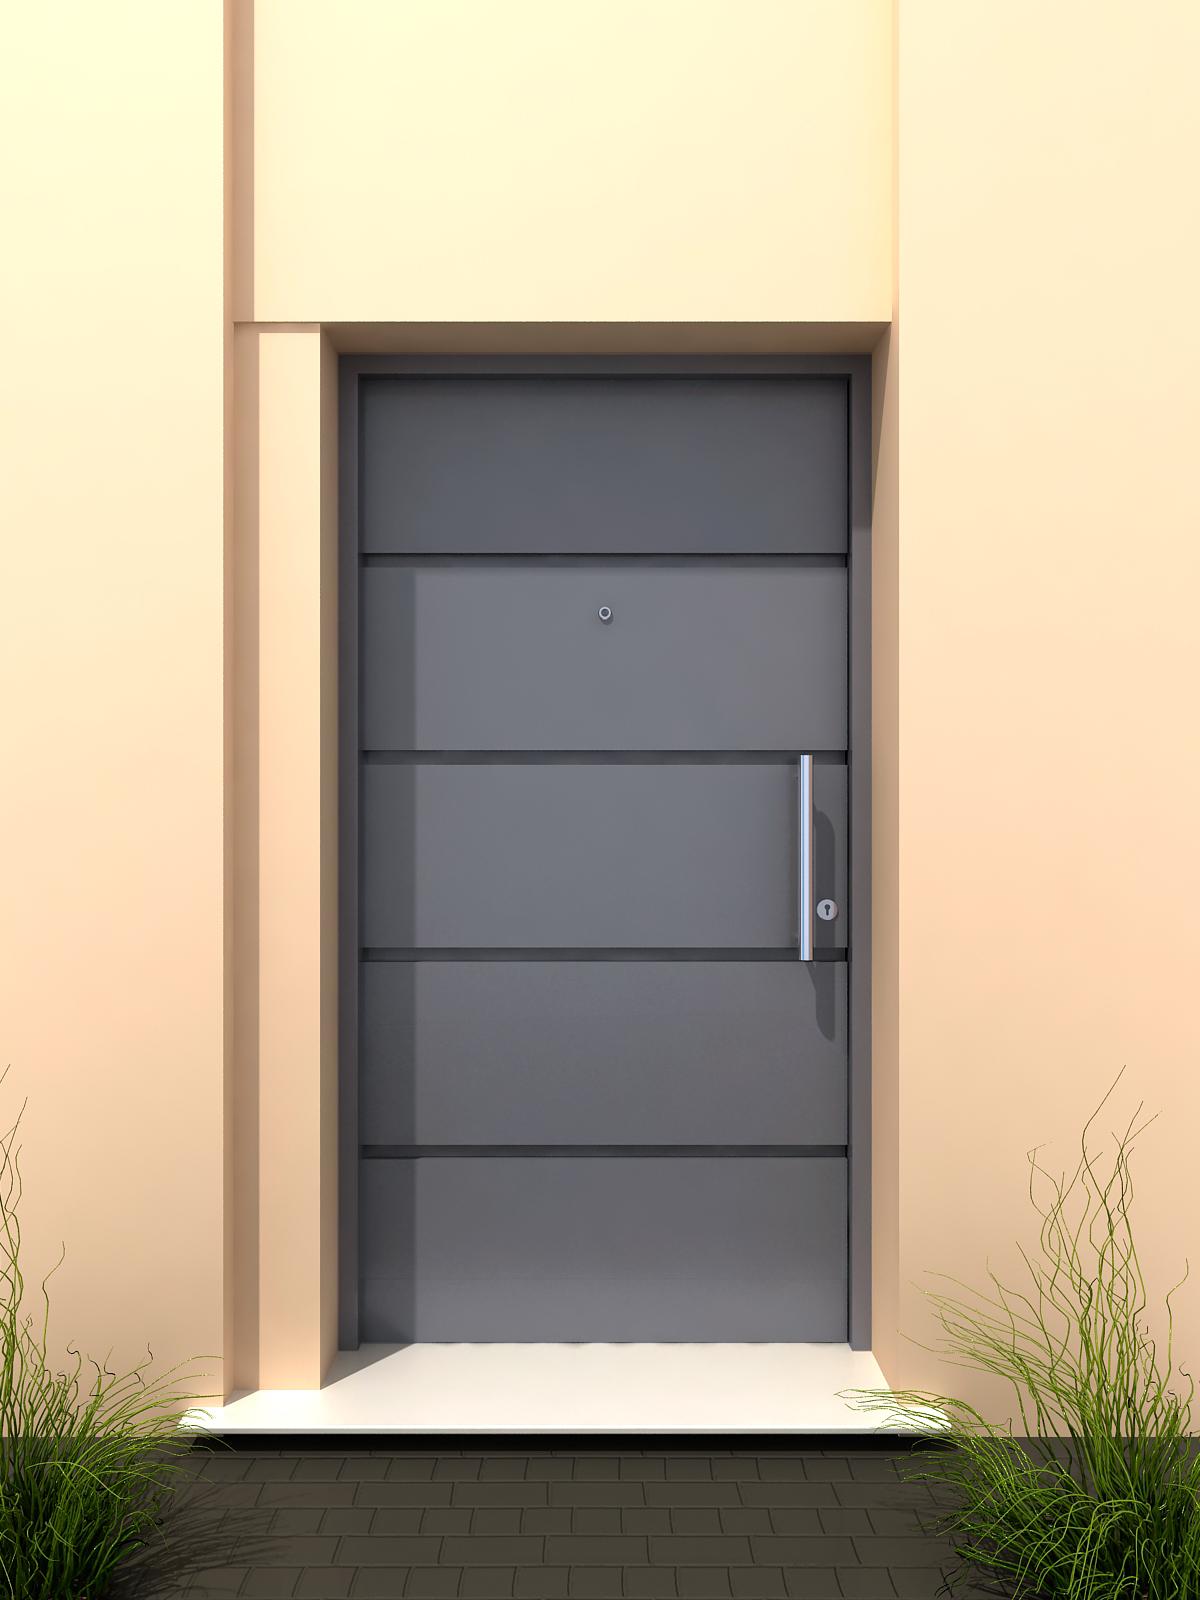 Aberturas mitre puertas de exterior chapa metalicas for Puertas metalicas modernas para exterior